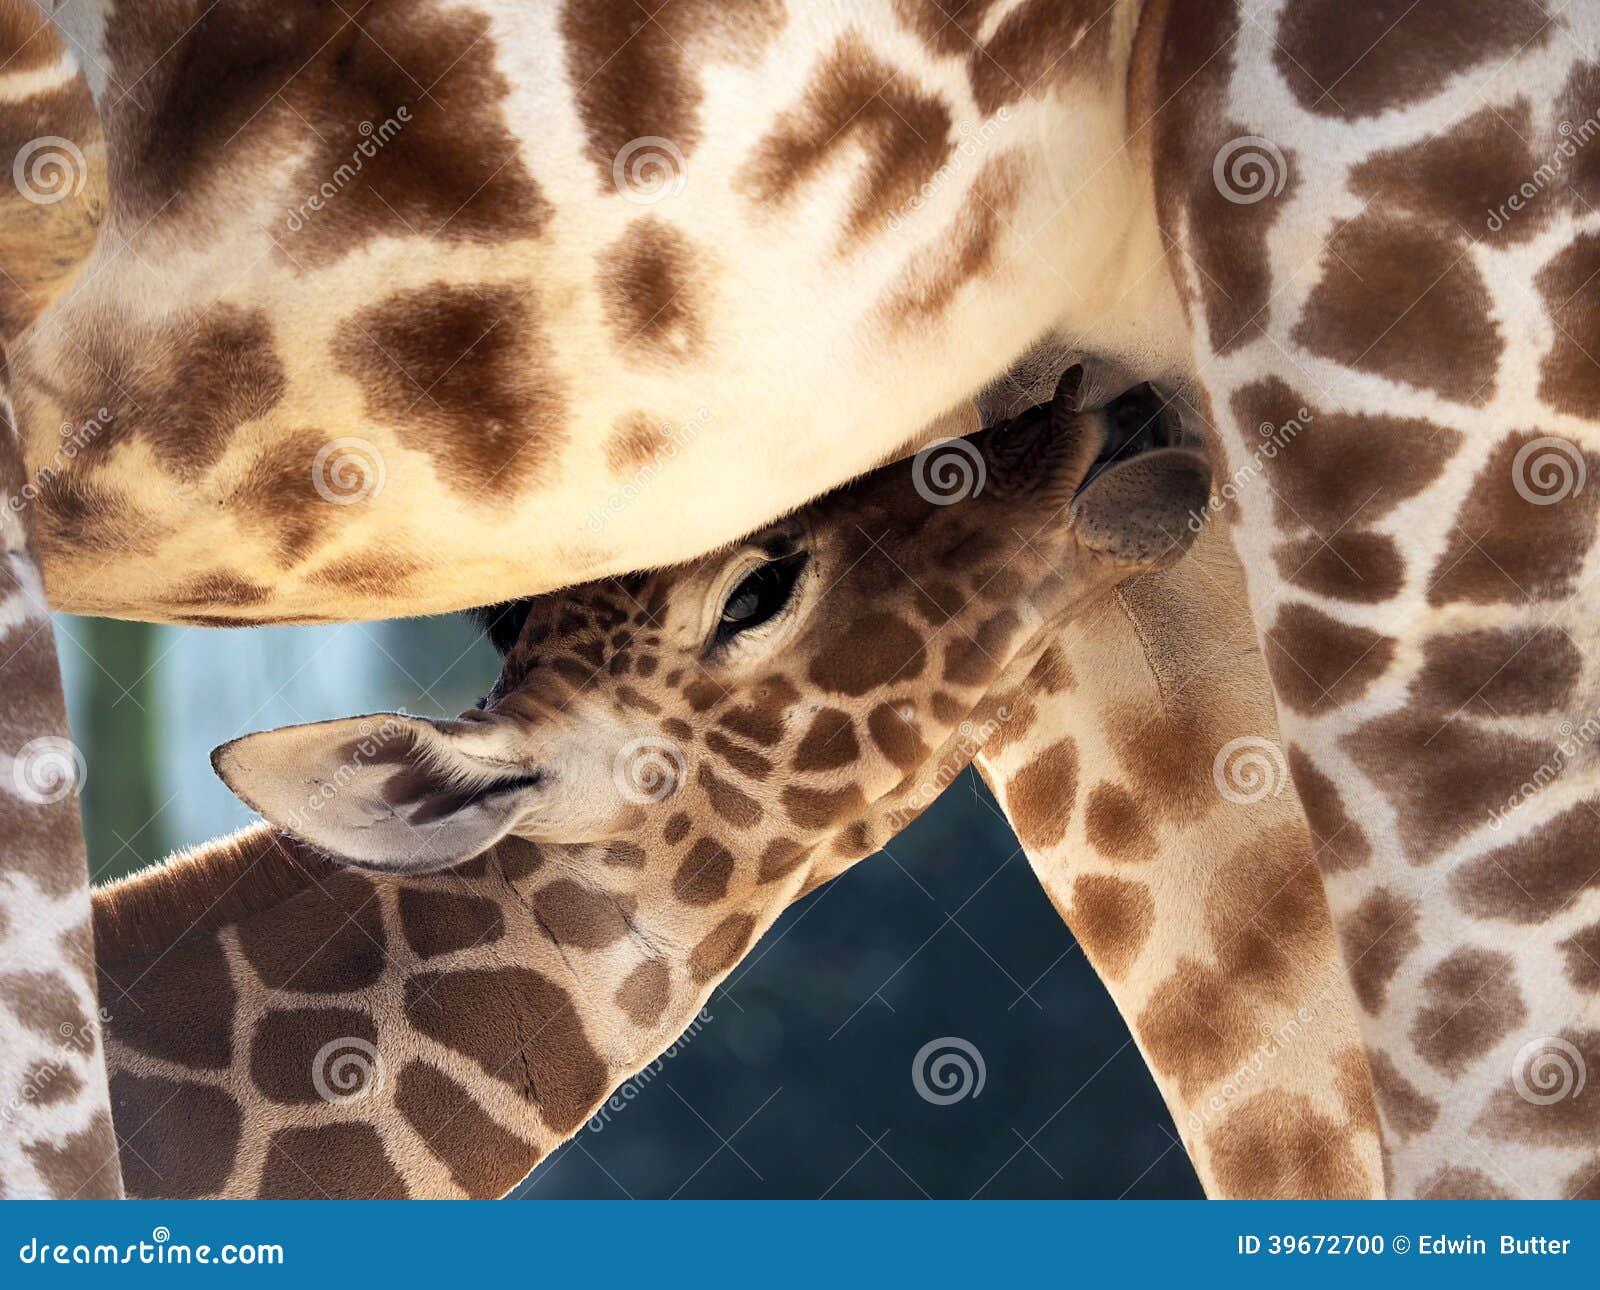 Milk drinking baby giraffe